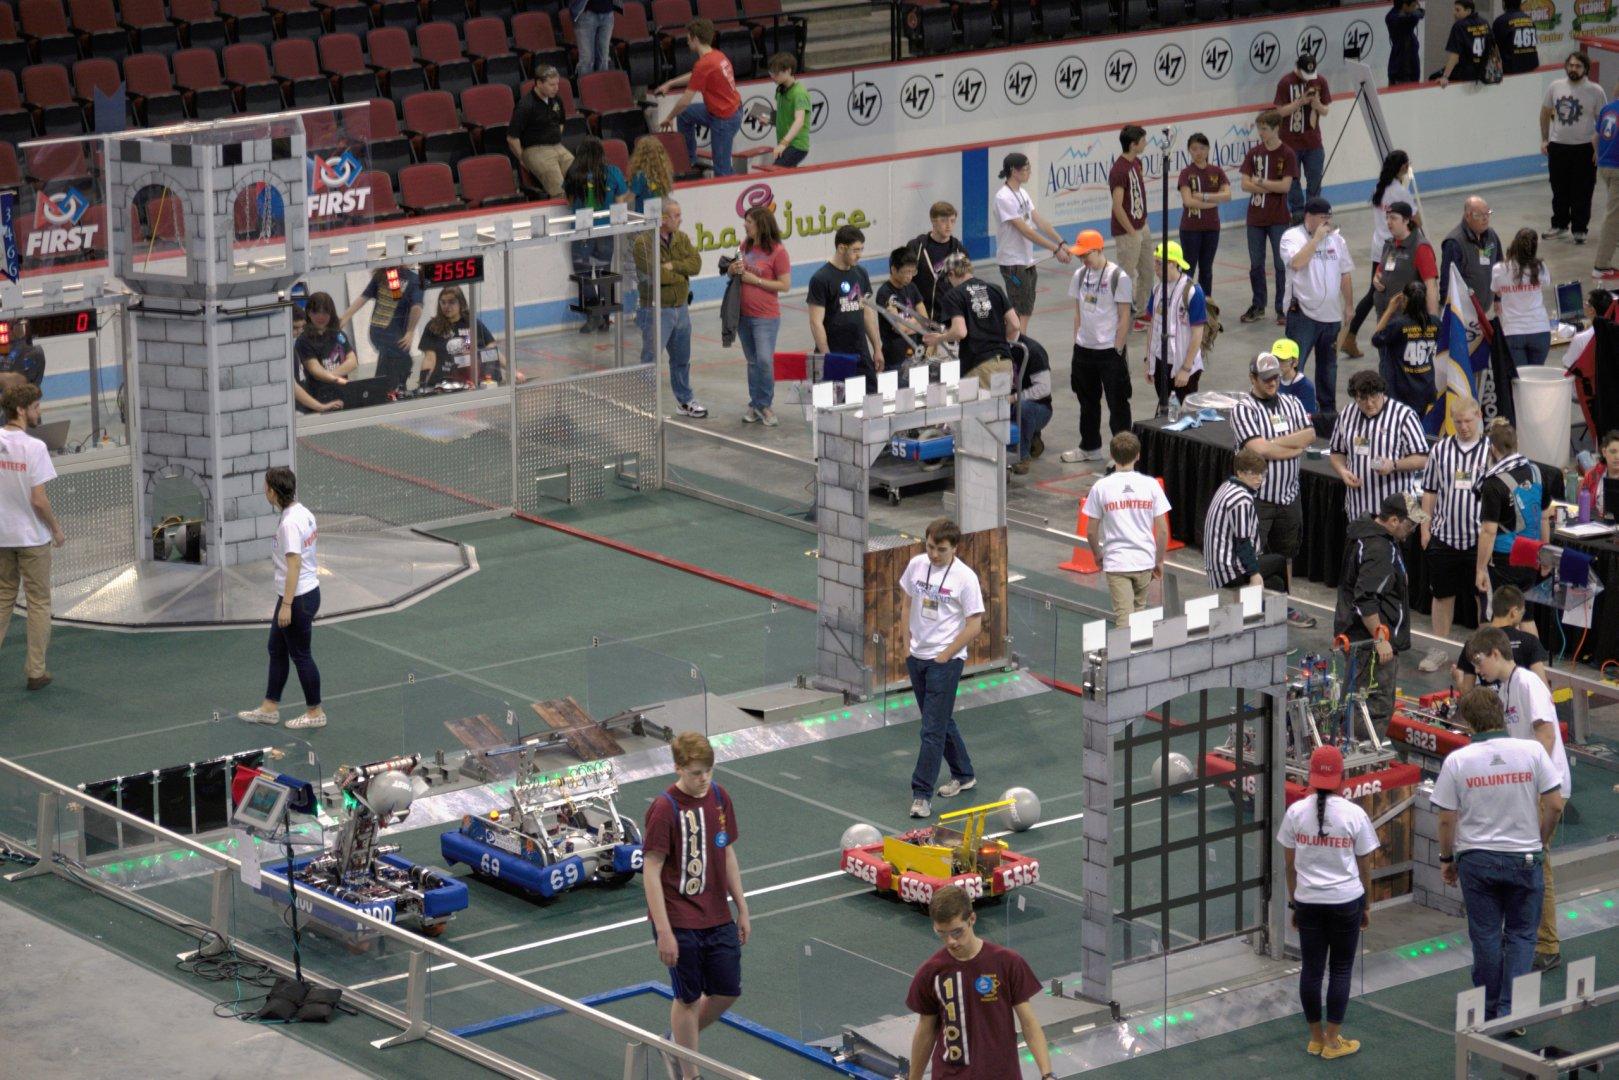 056.Boston FIRST Robotics Competition 04-03-2016.jpg